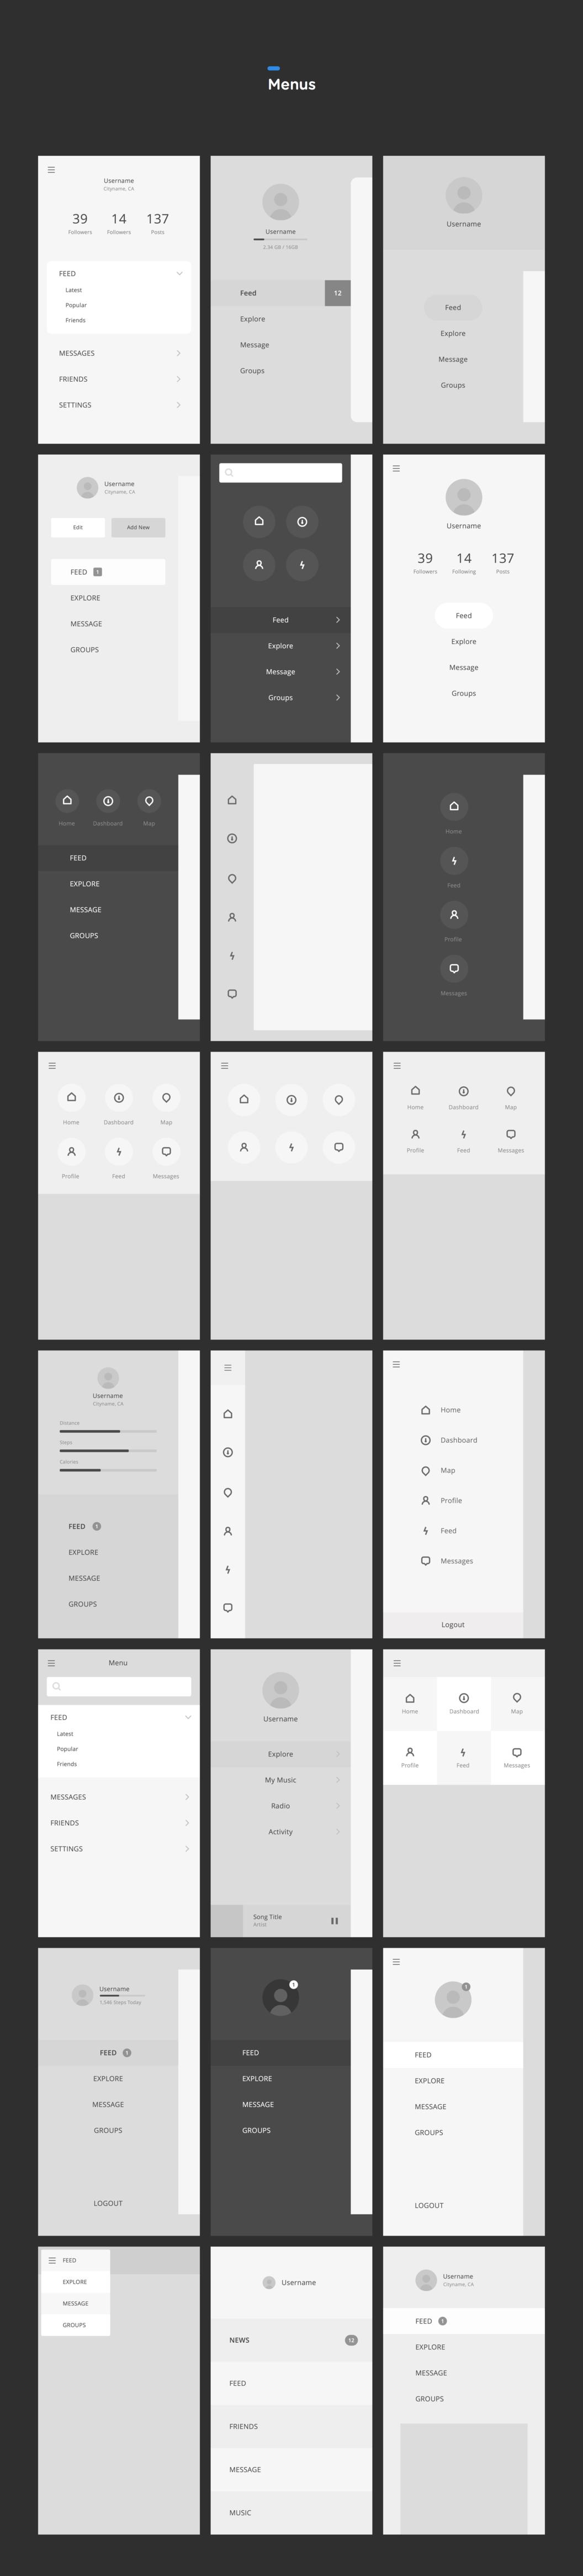 Menu Wireframe Templates User interface design